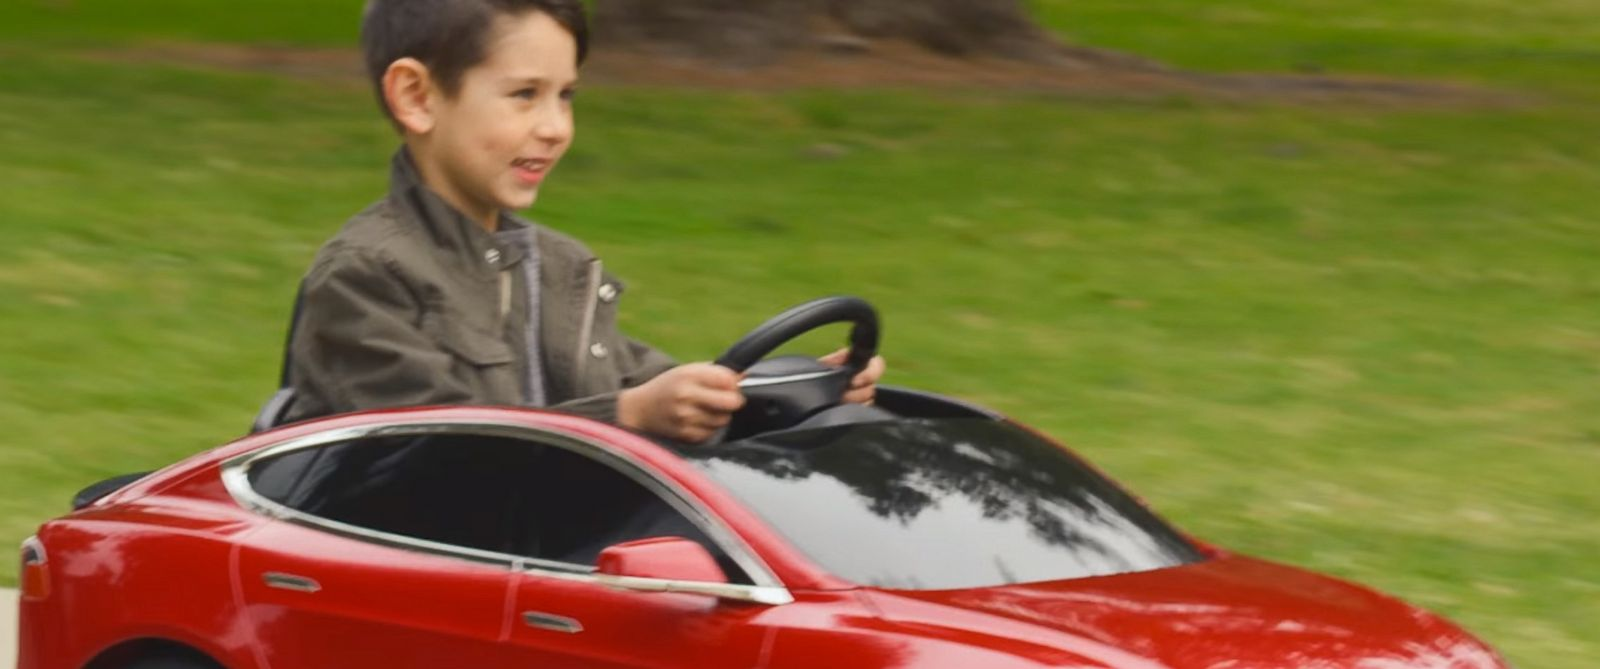 PHOTO: Radio Flyer has created a miniature Tesla Model S for kids.